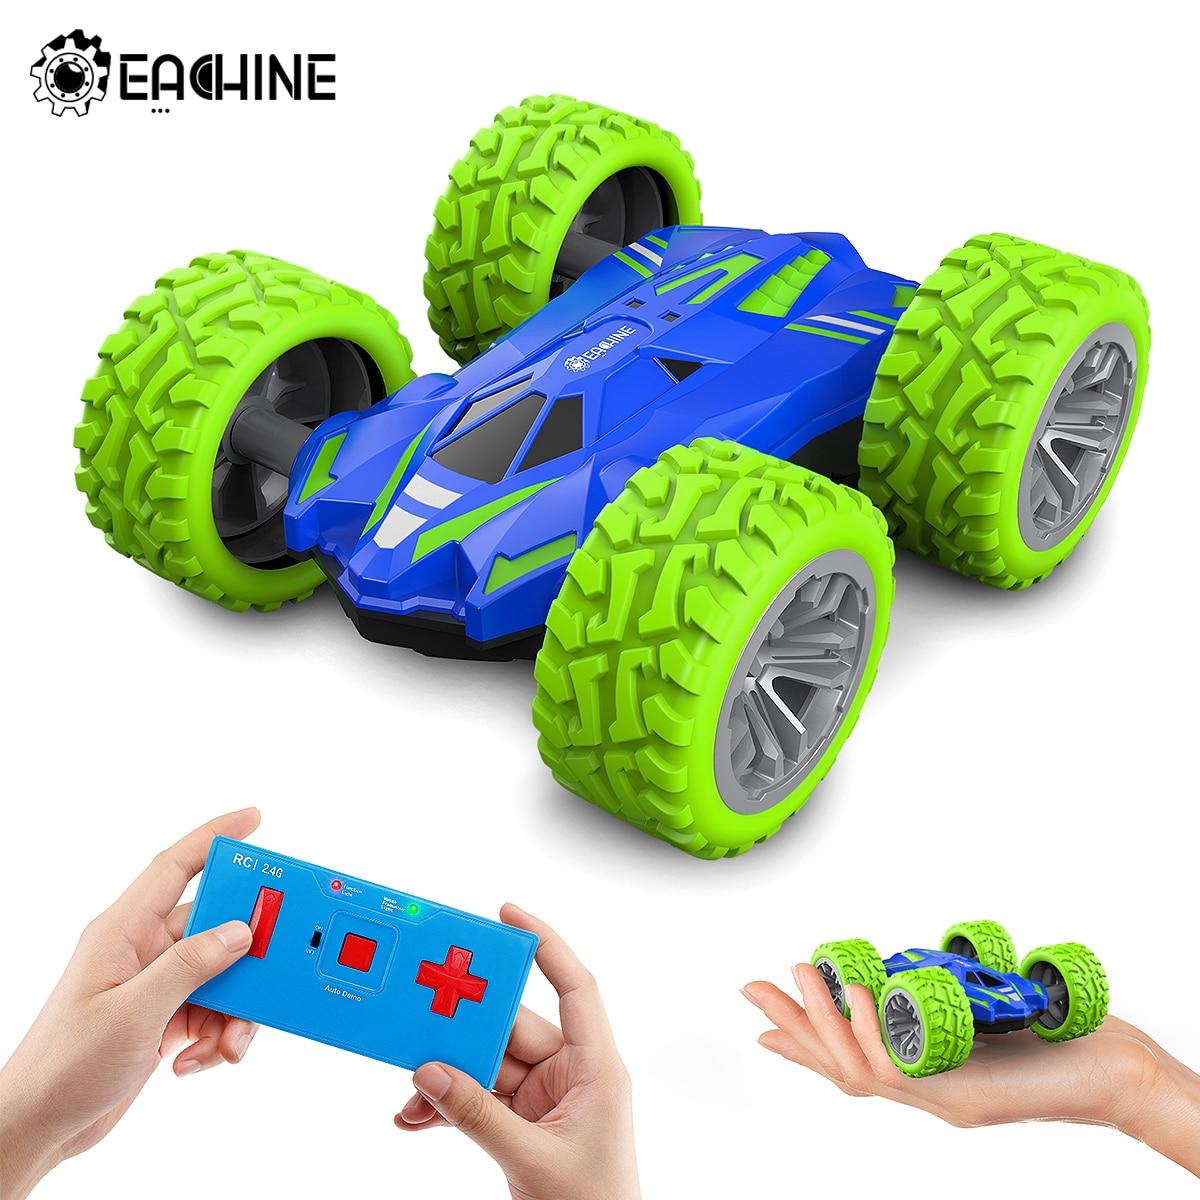 Eachine ec07 RC Car 2.4G 4CH Stunt Drift Deformation Remote Control Rock Crawler Roll Flip Kids Robot Auto Toy